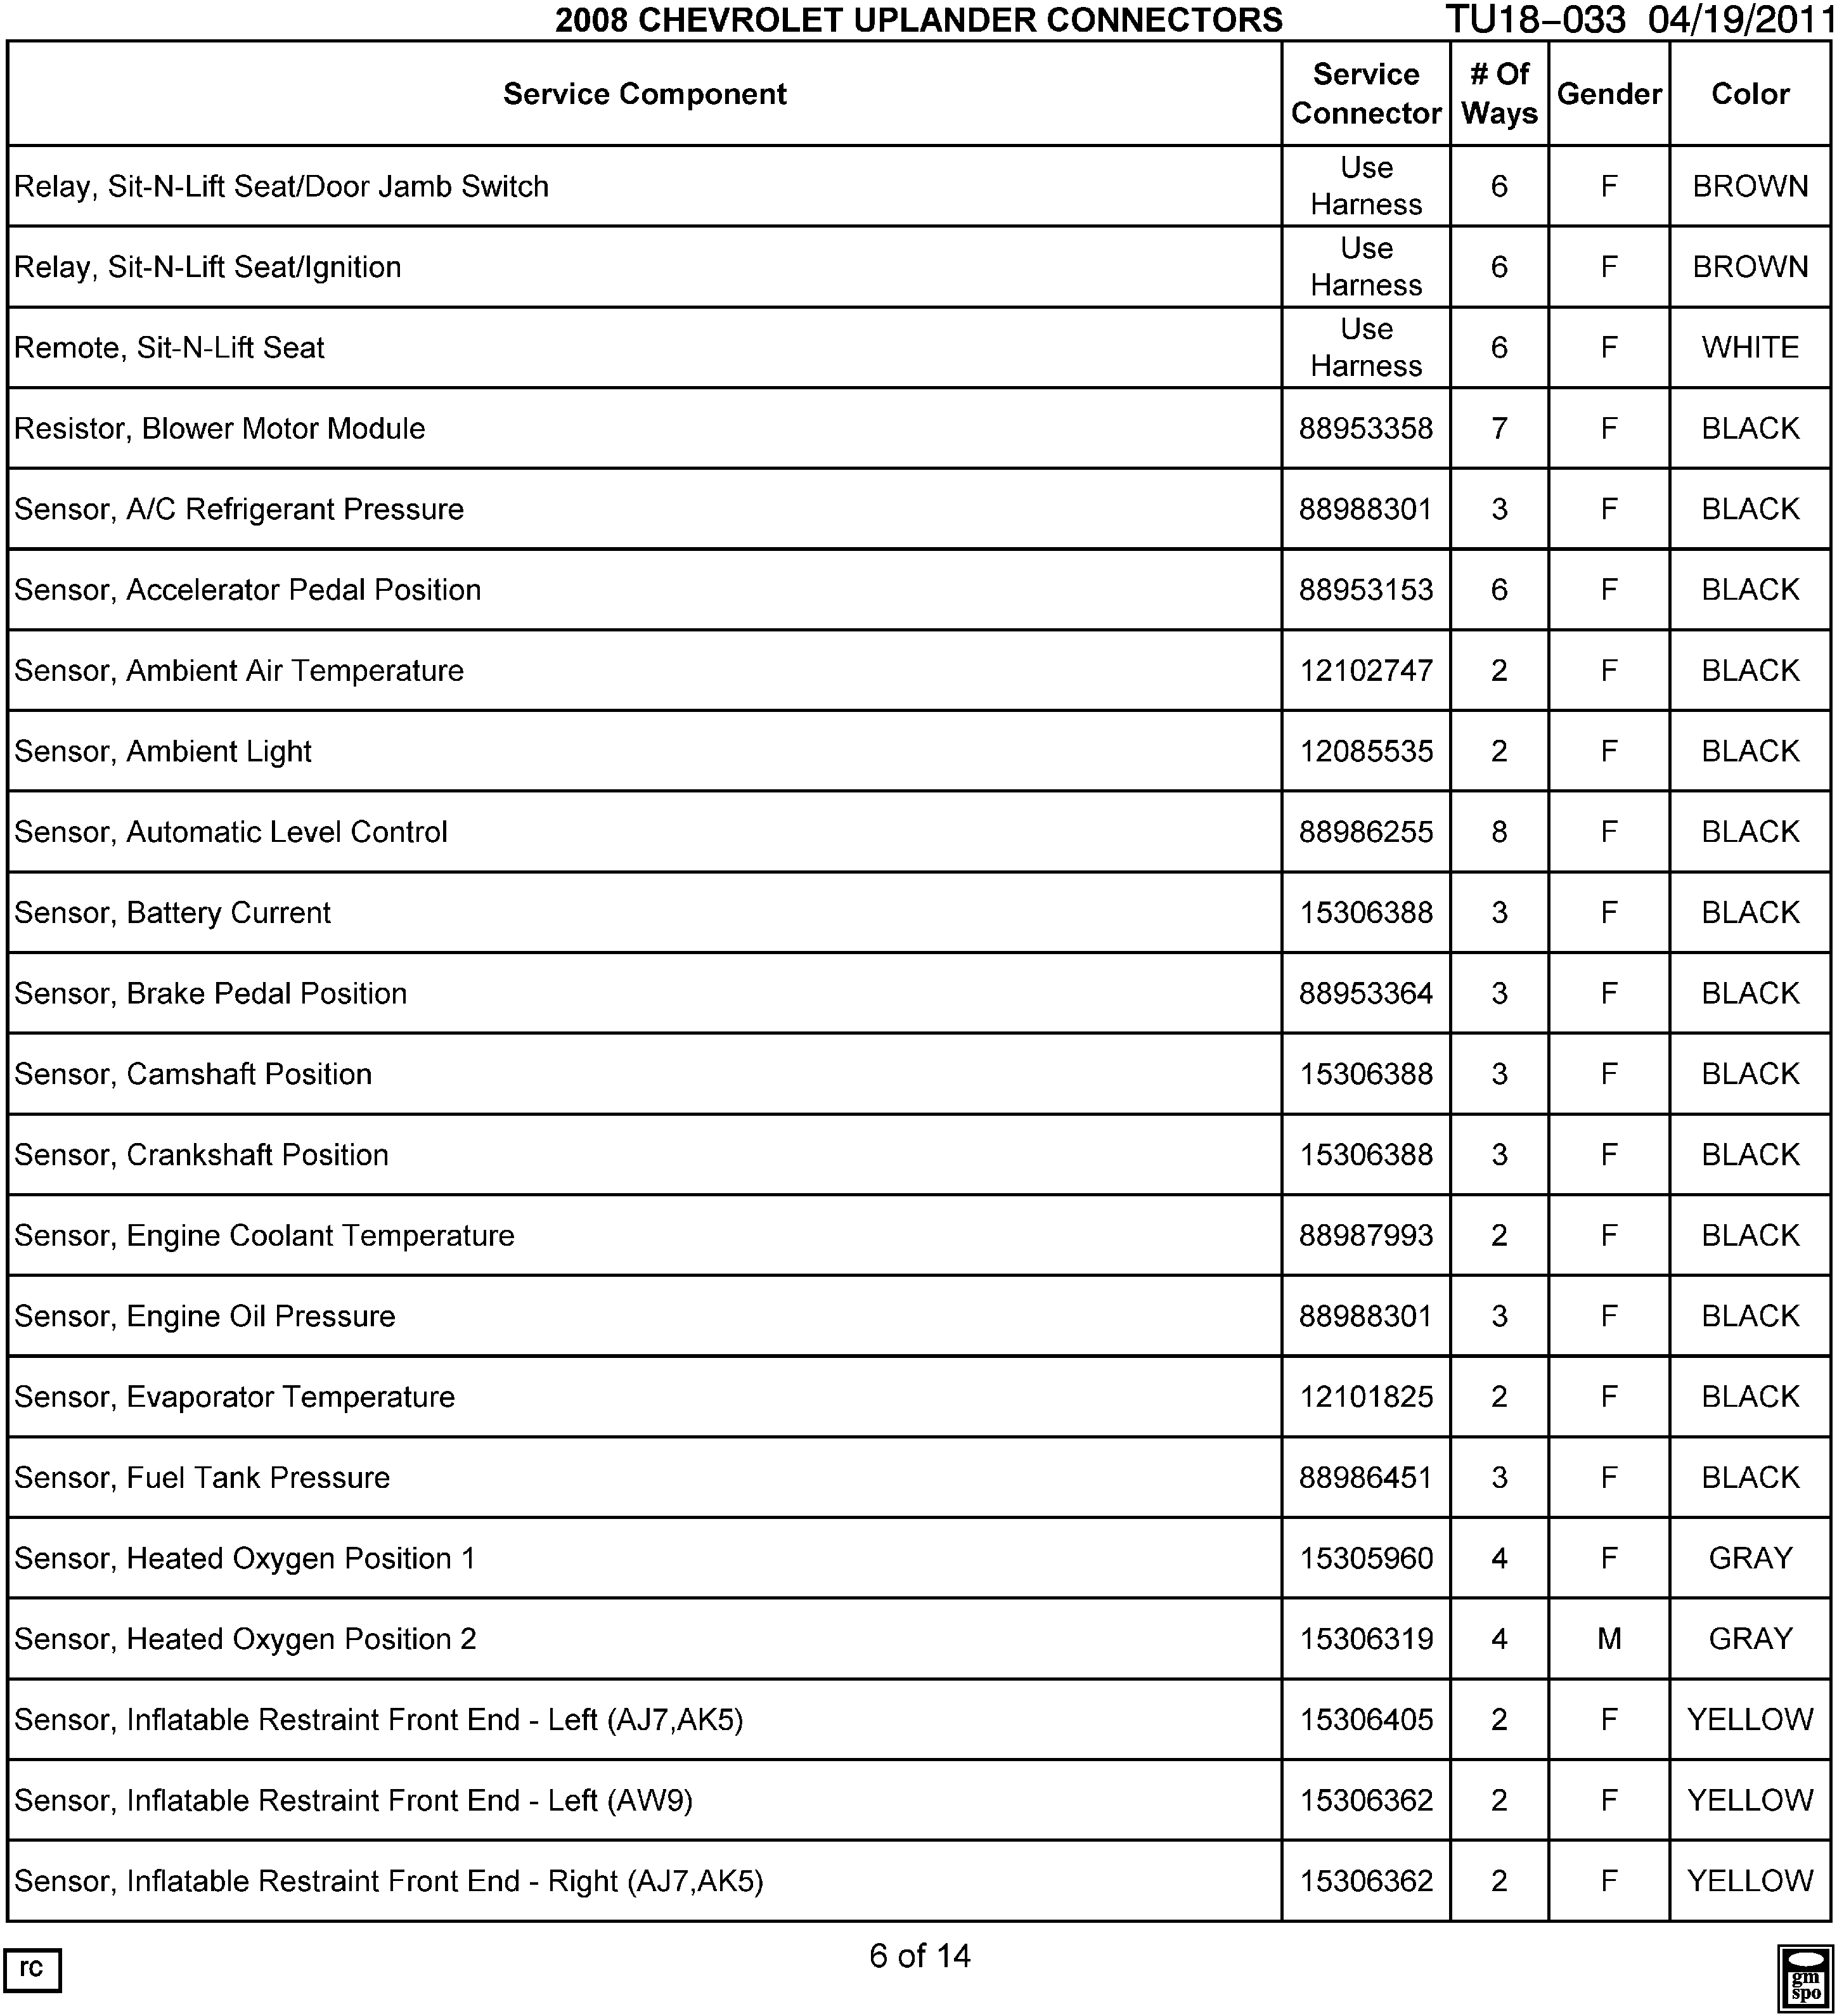 Pontiac Montana SV6 - Ext wheelbase (2WD) - UX ELECTRICAL CONNECTOR ...